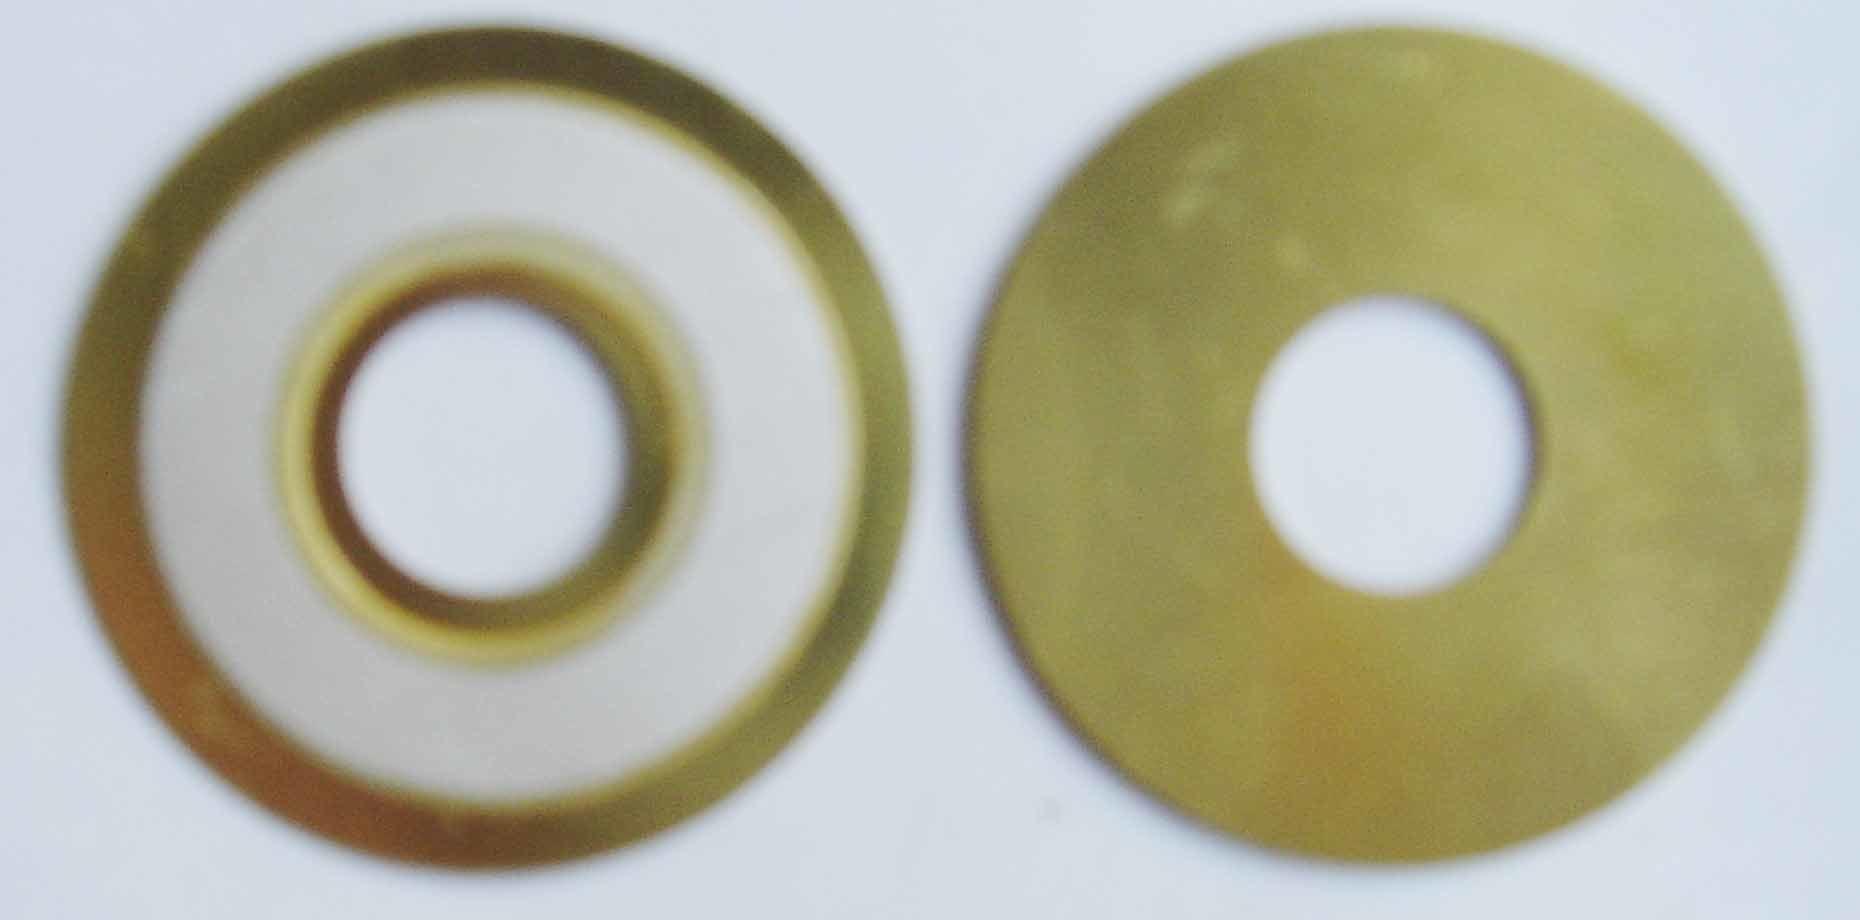 20mm 1MHz Piezo Ceramic Ultrasonic Transducer